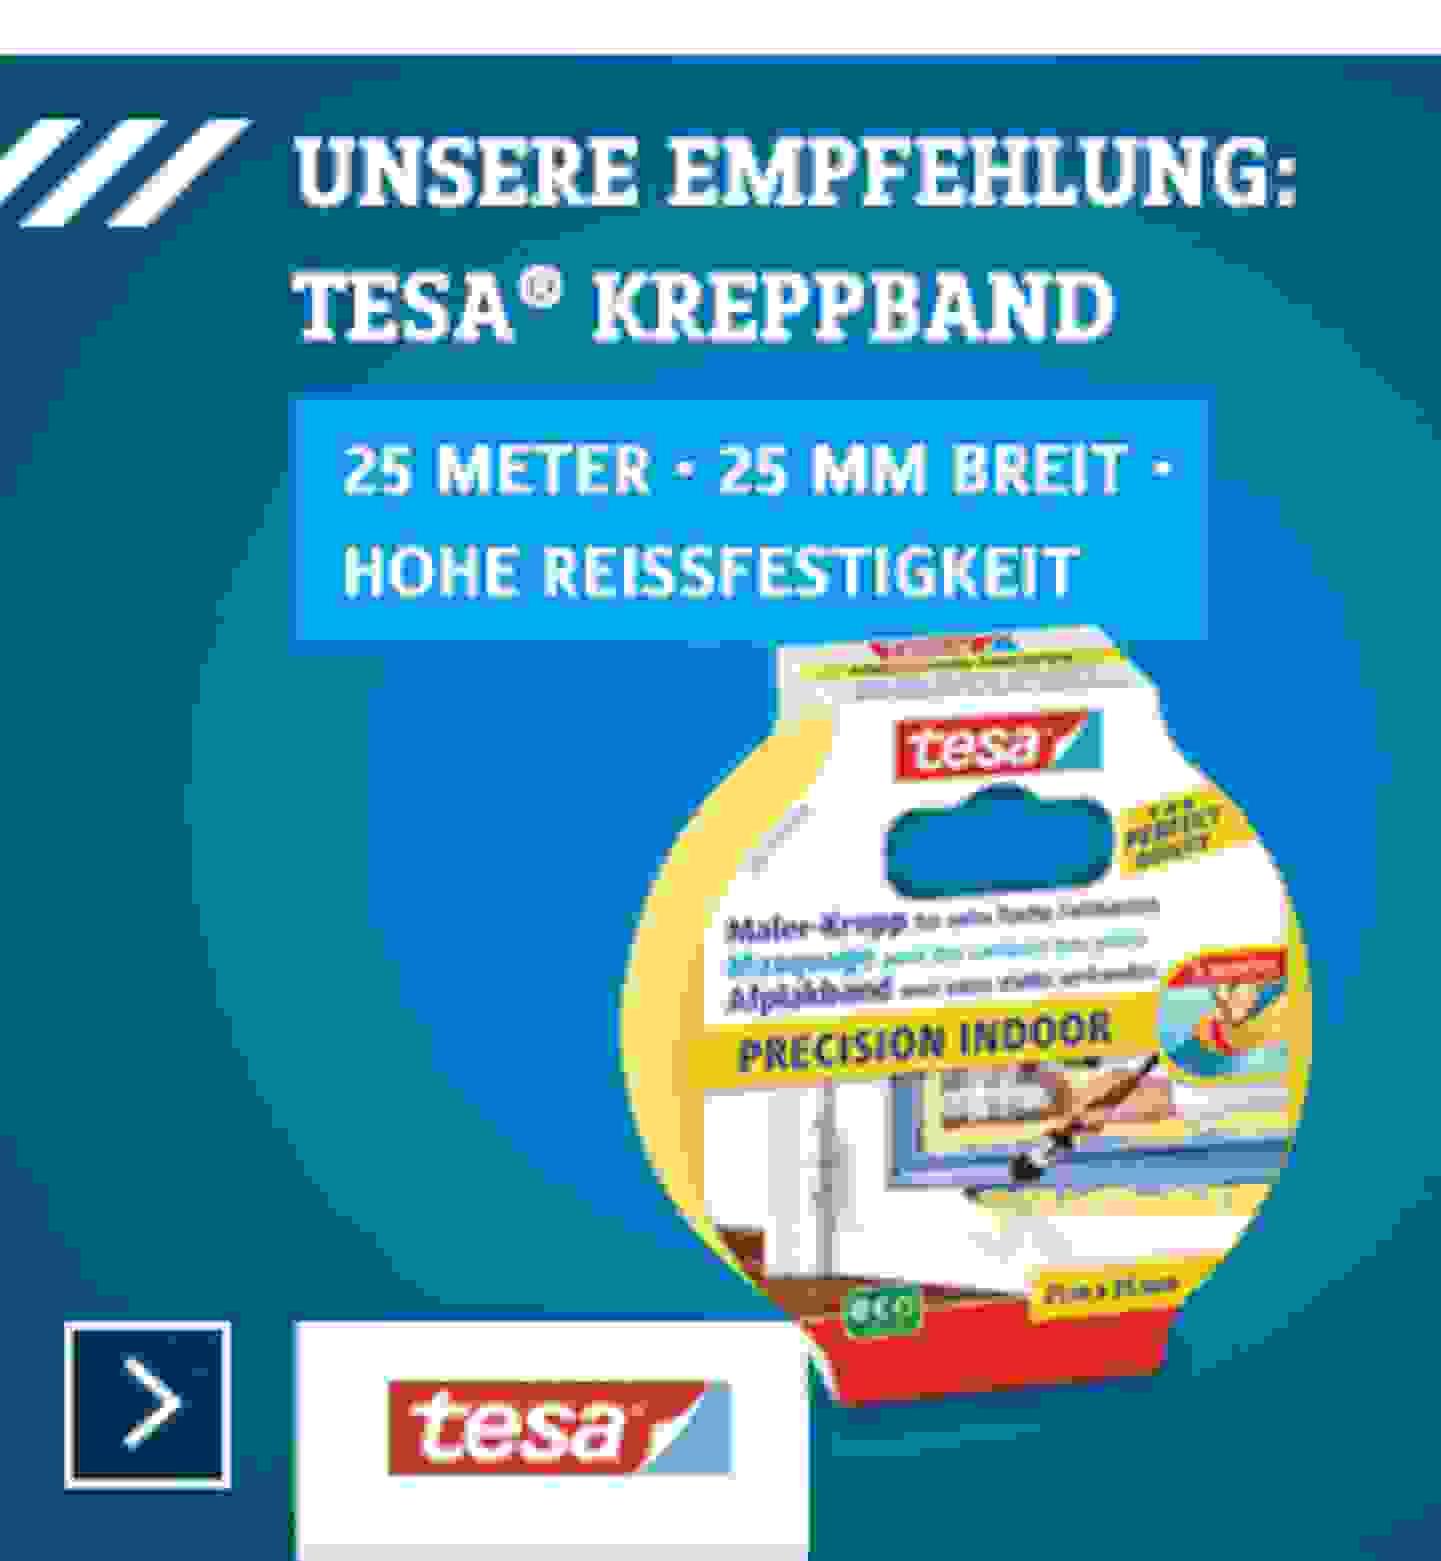 Kreppband - Tesa